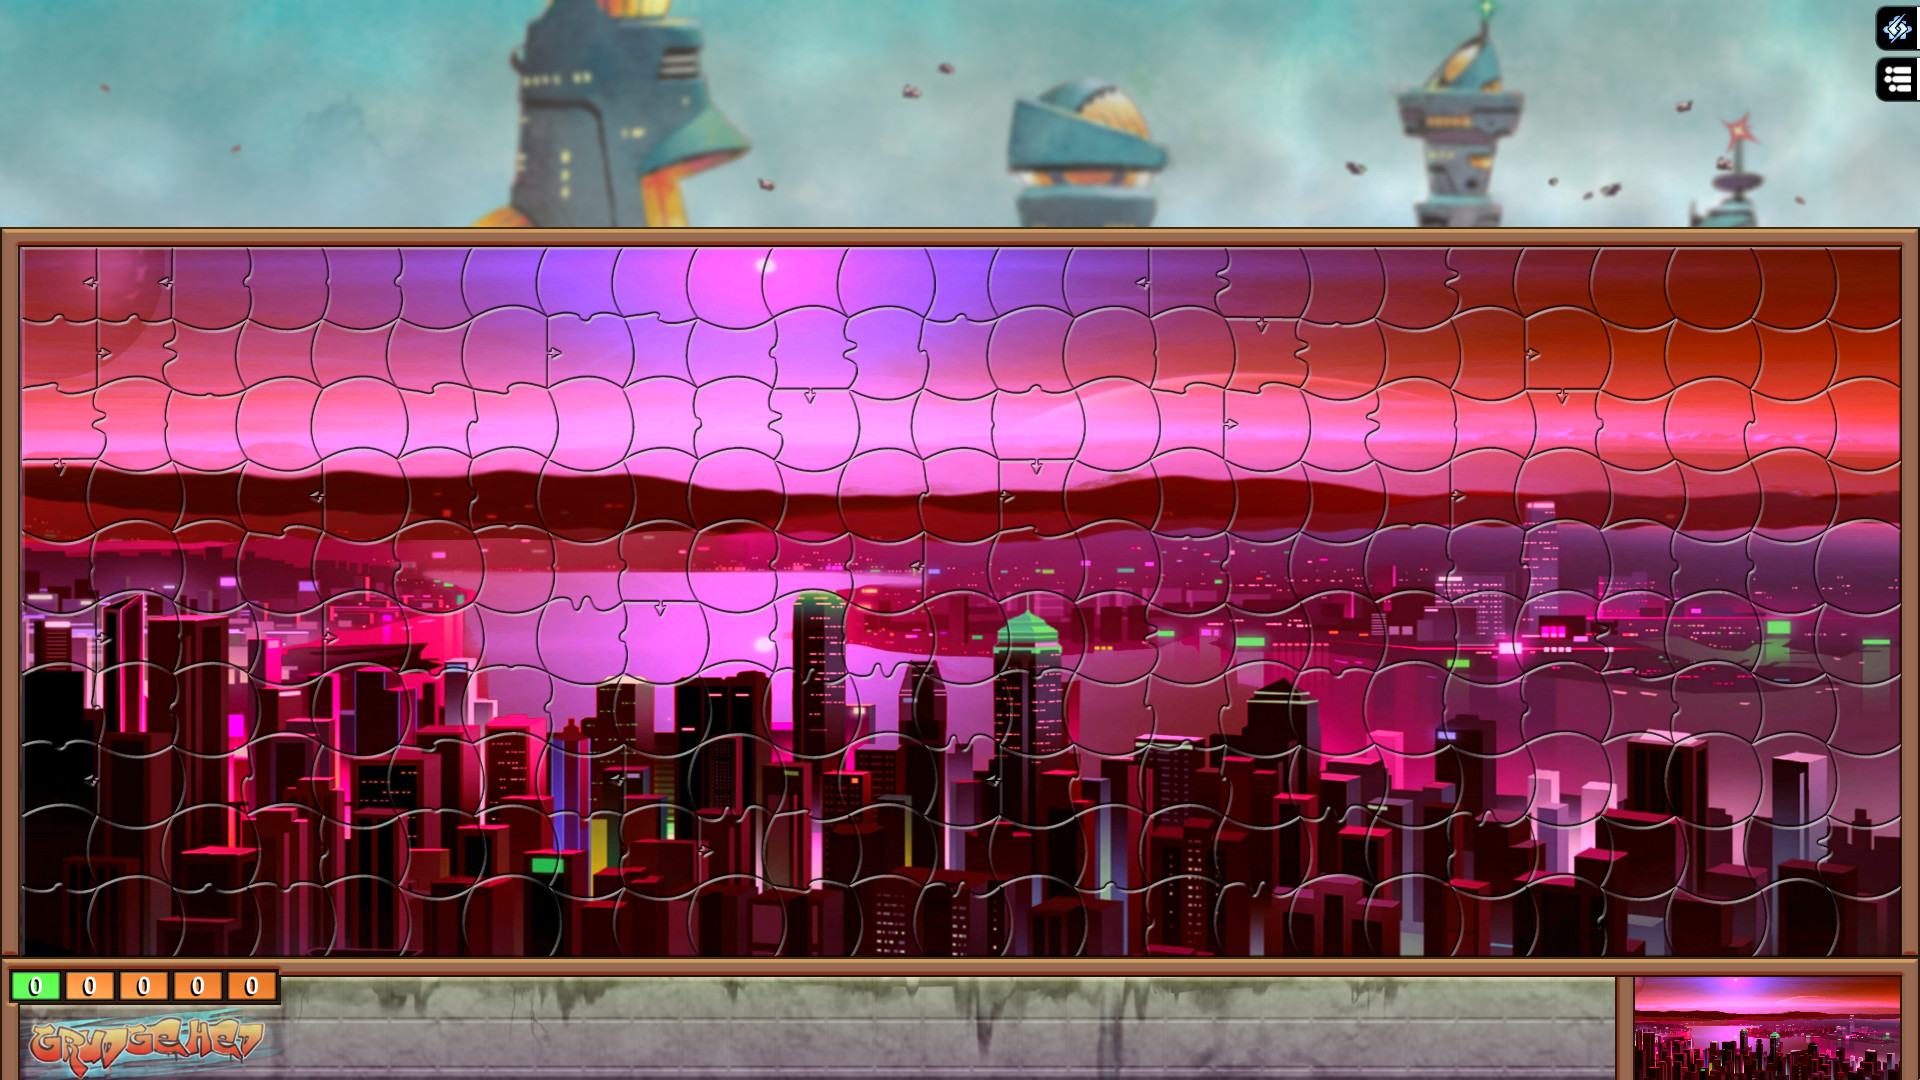 Jigsaw Puzzle Pack - Pixel Puzzles Ultimate: Cyberpunk screenshot